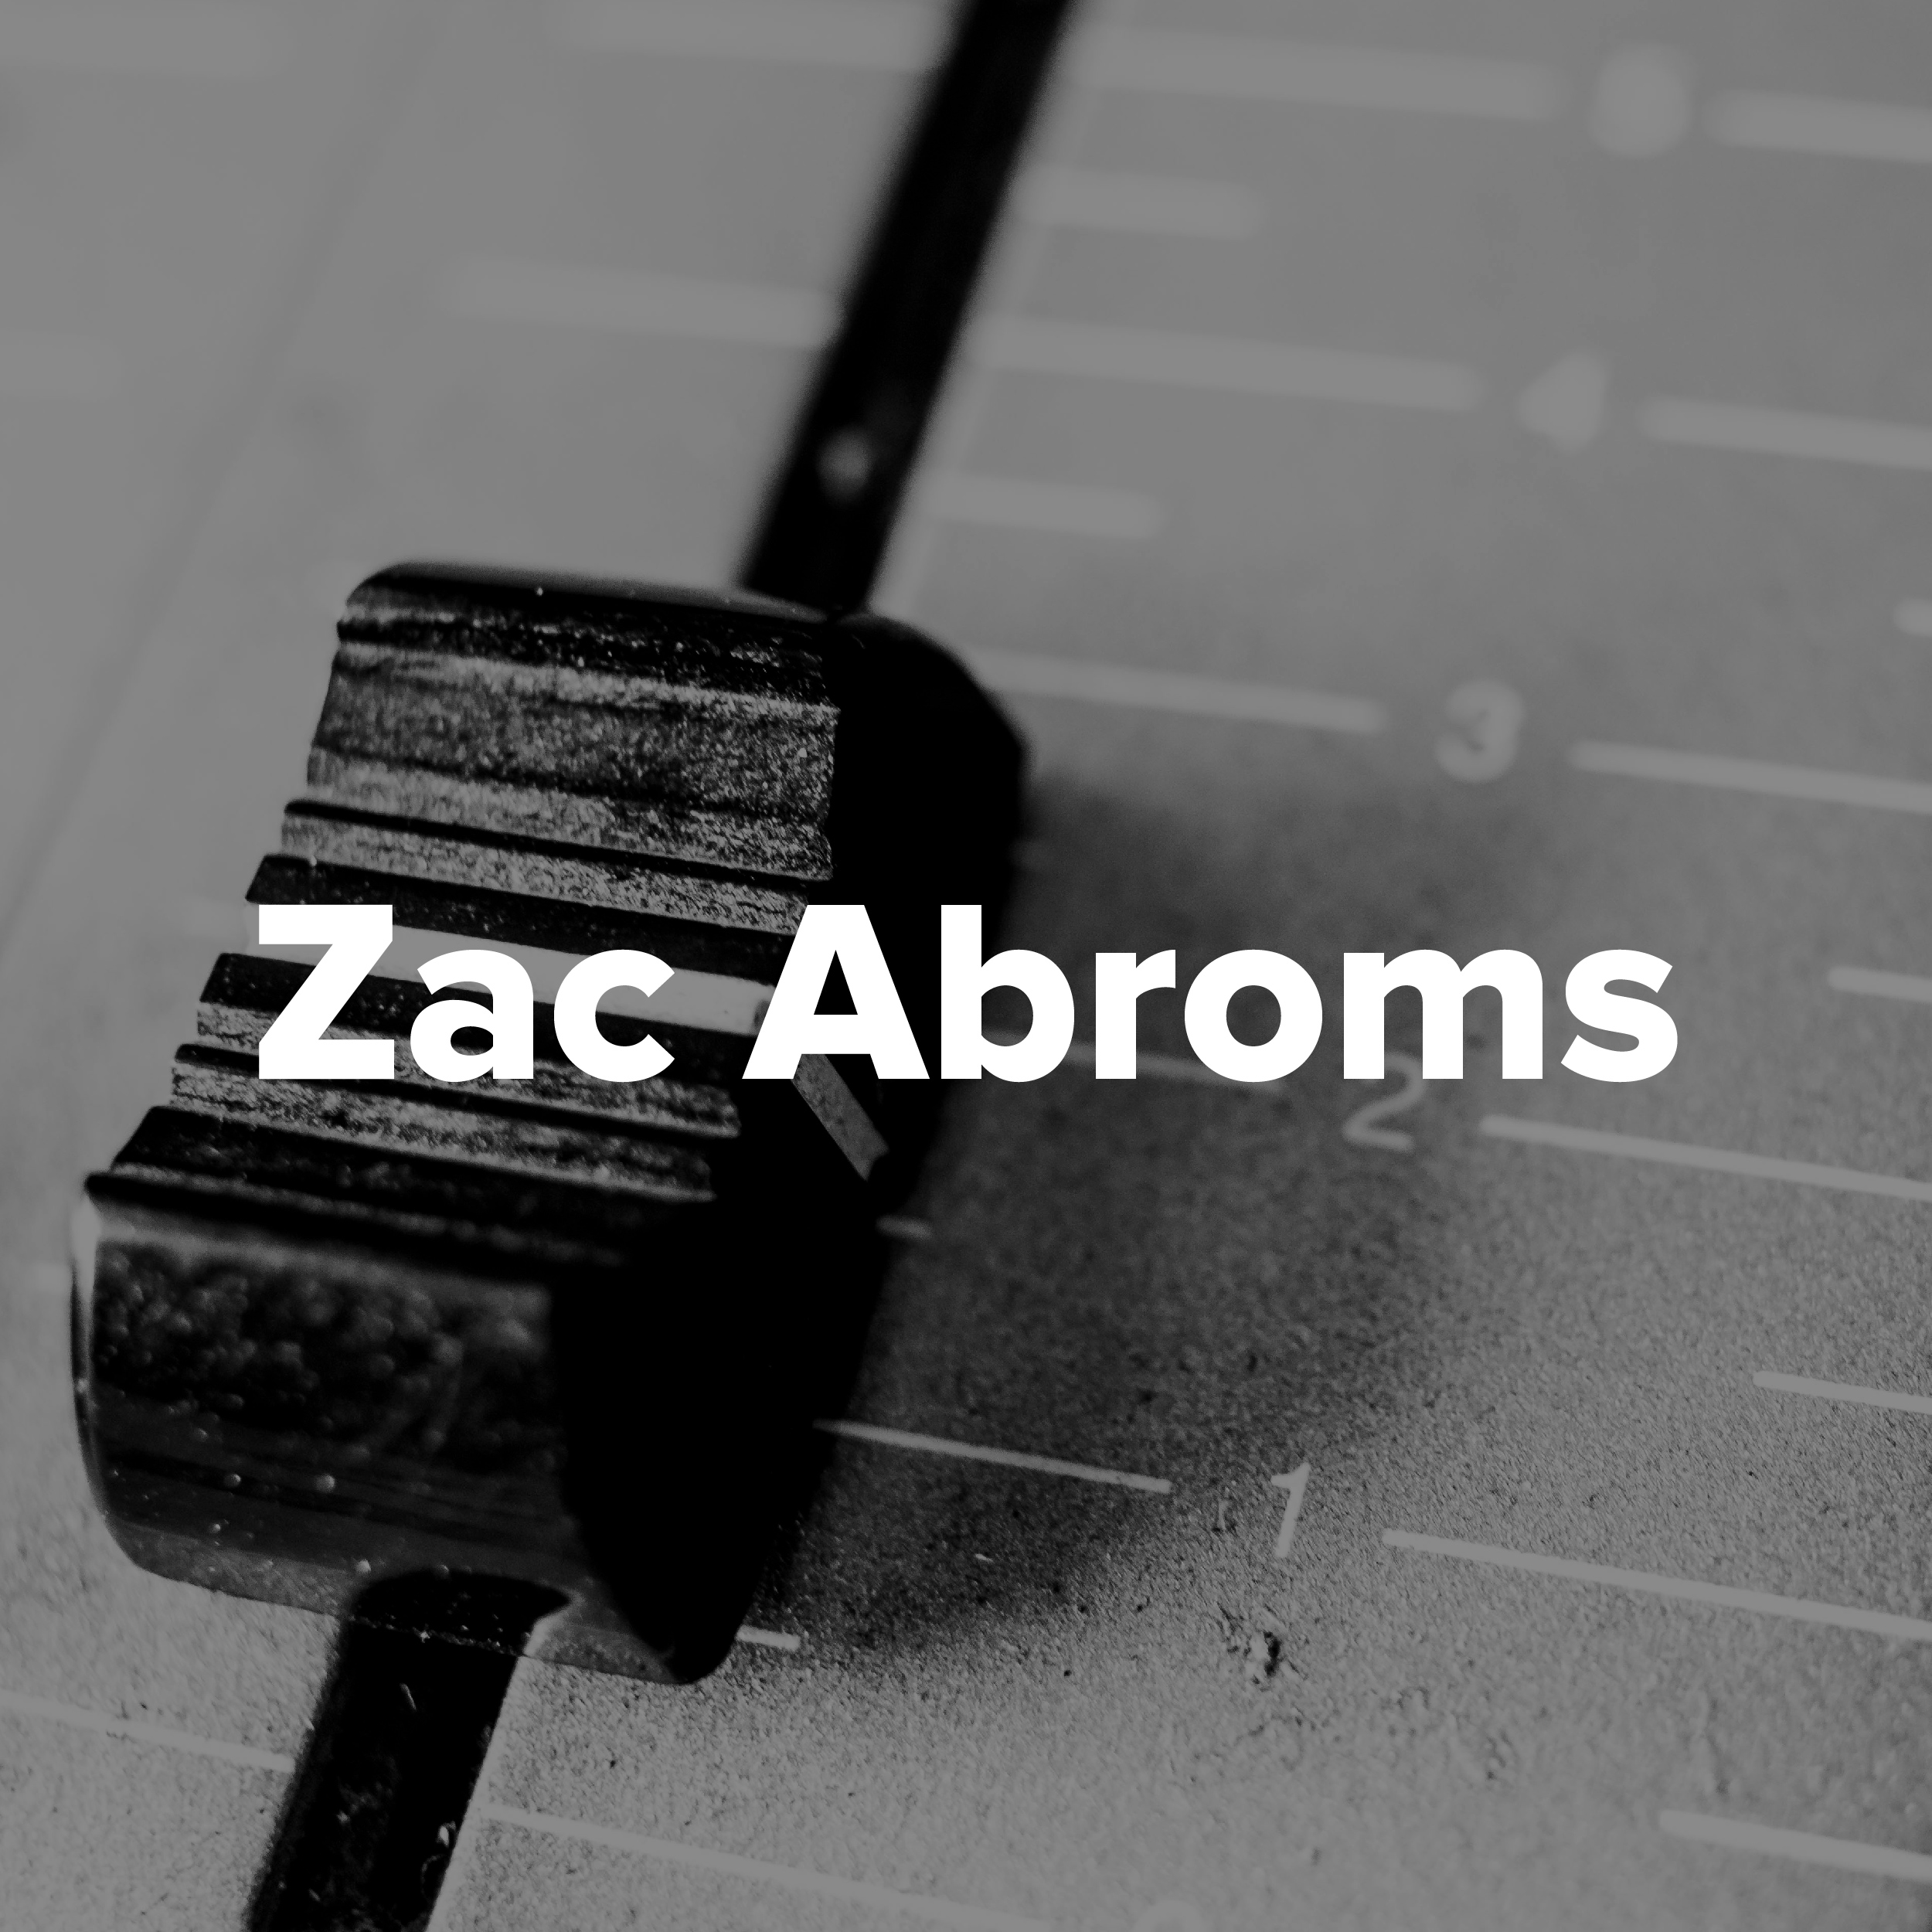 ZacAbroms.jpg